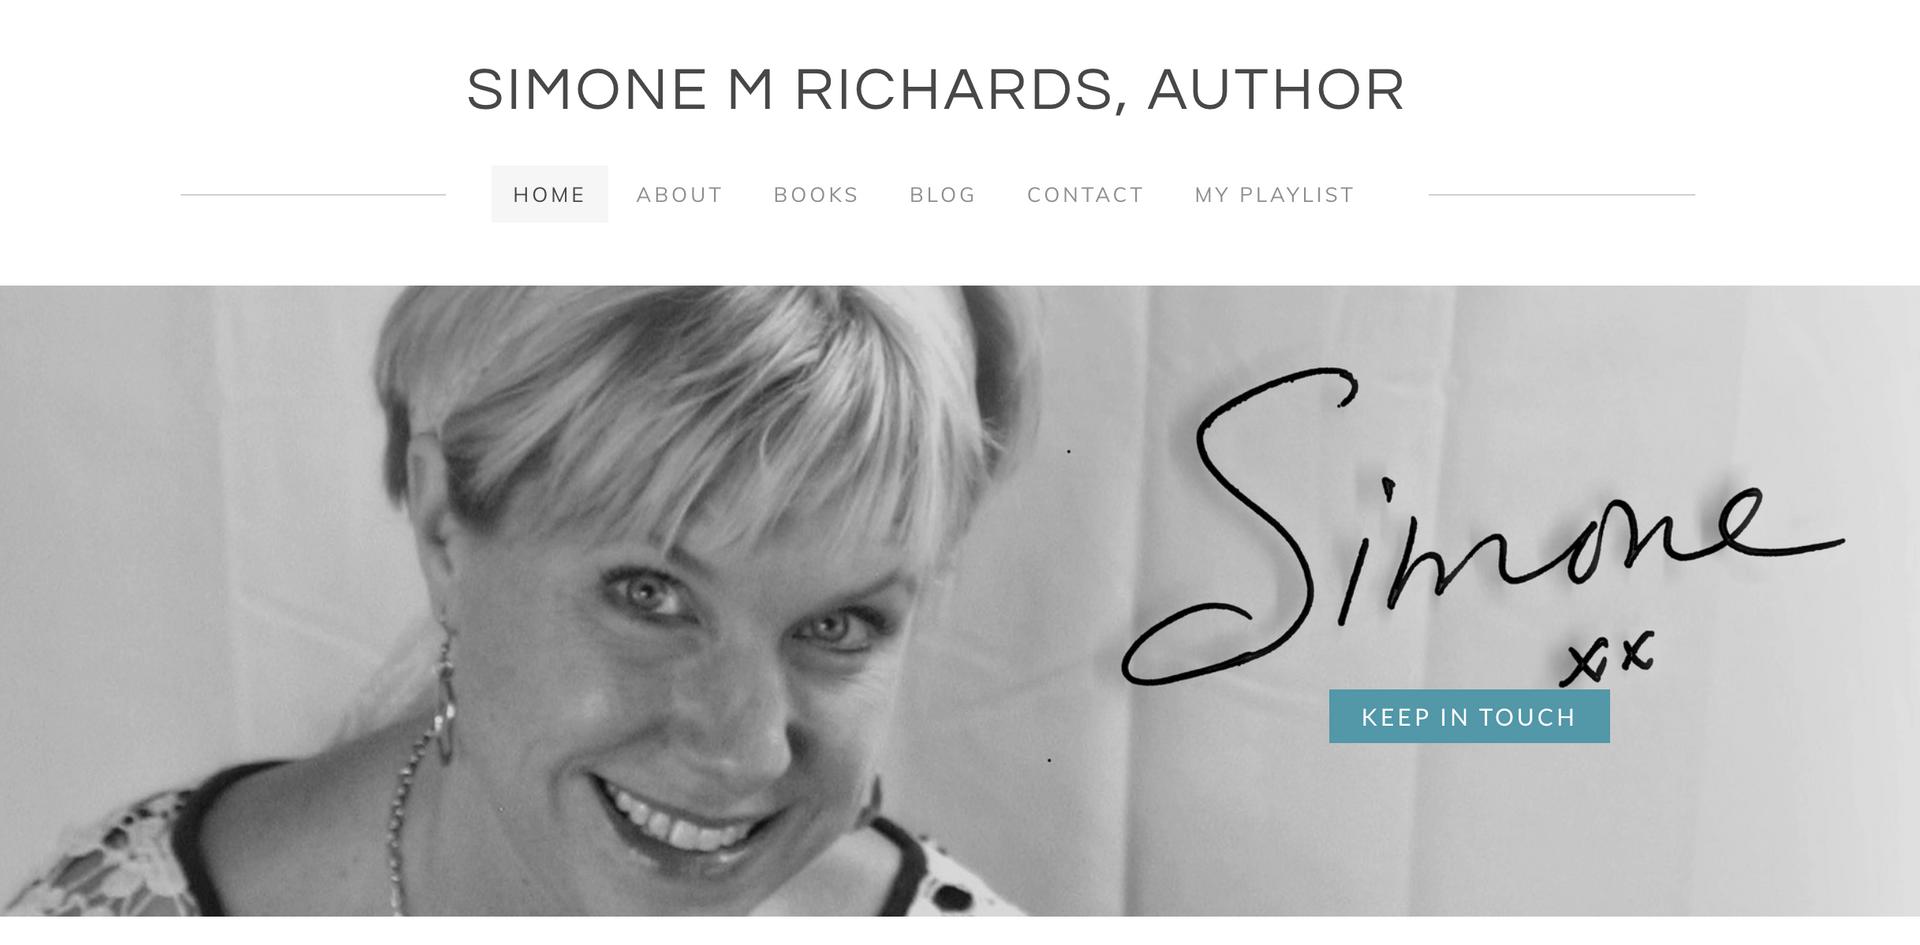 Simon Richards, Author Home Page